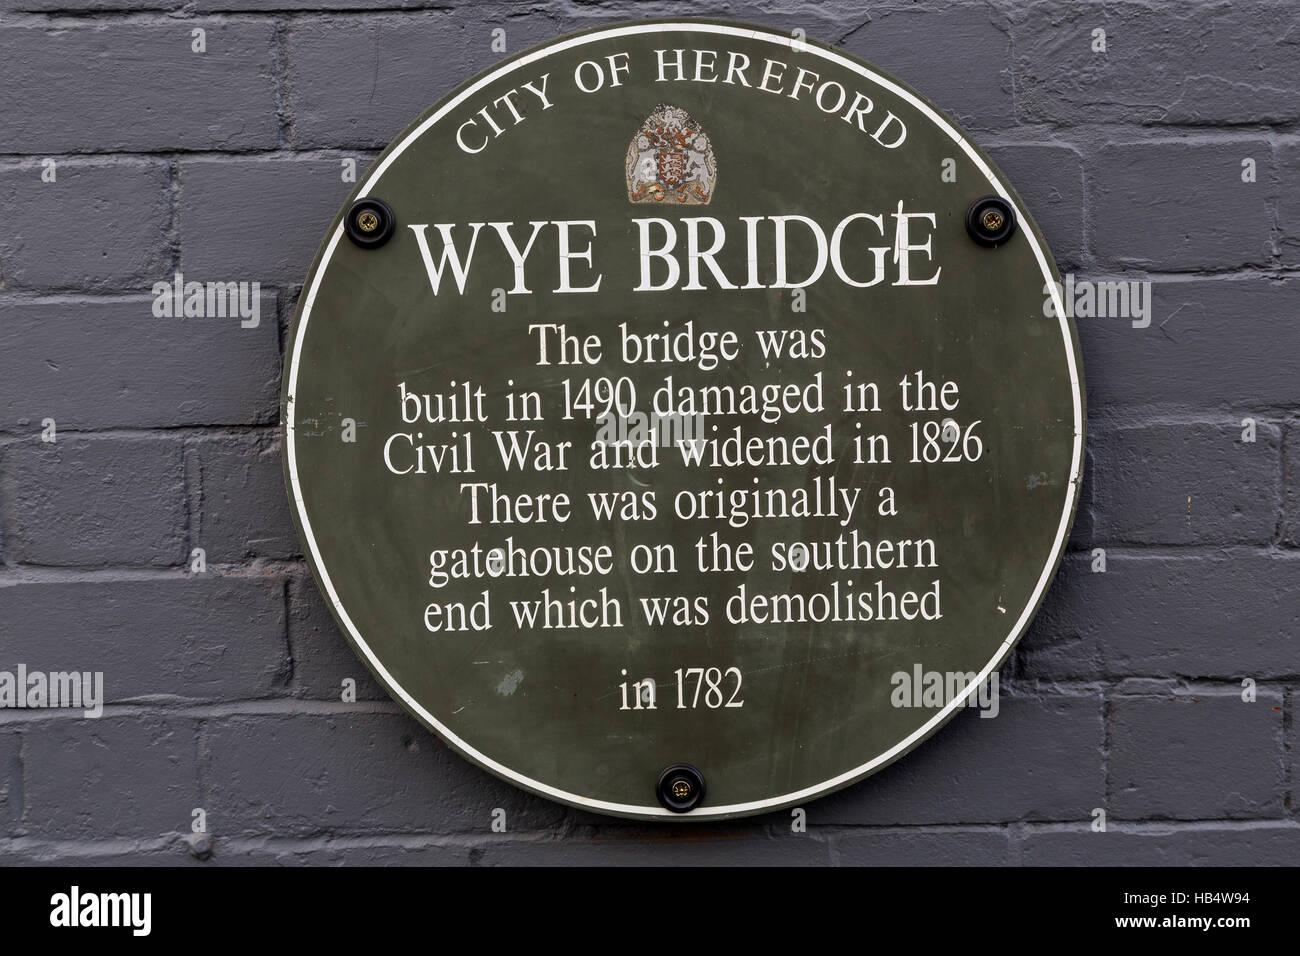 Plaque on Wye Bridge, Hereford, England, UK - Stock Image